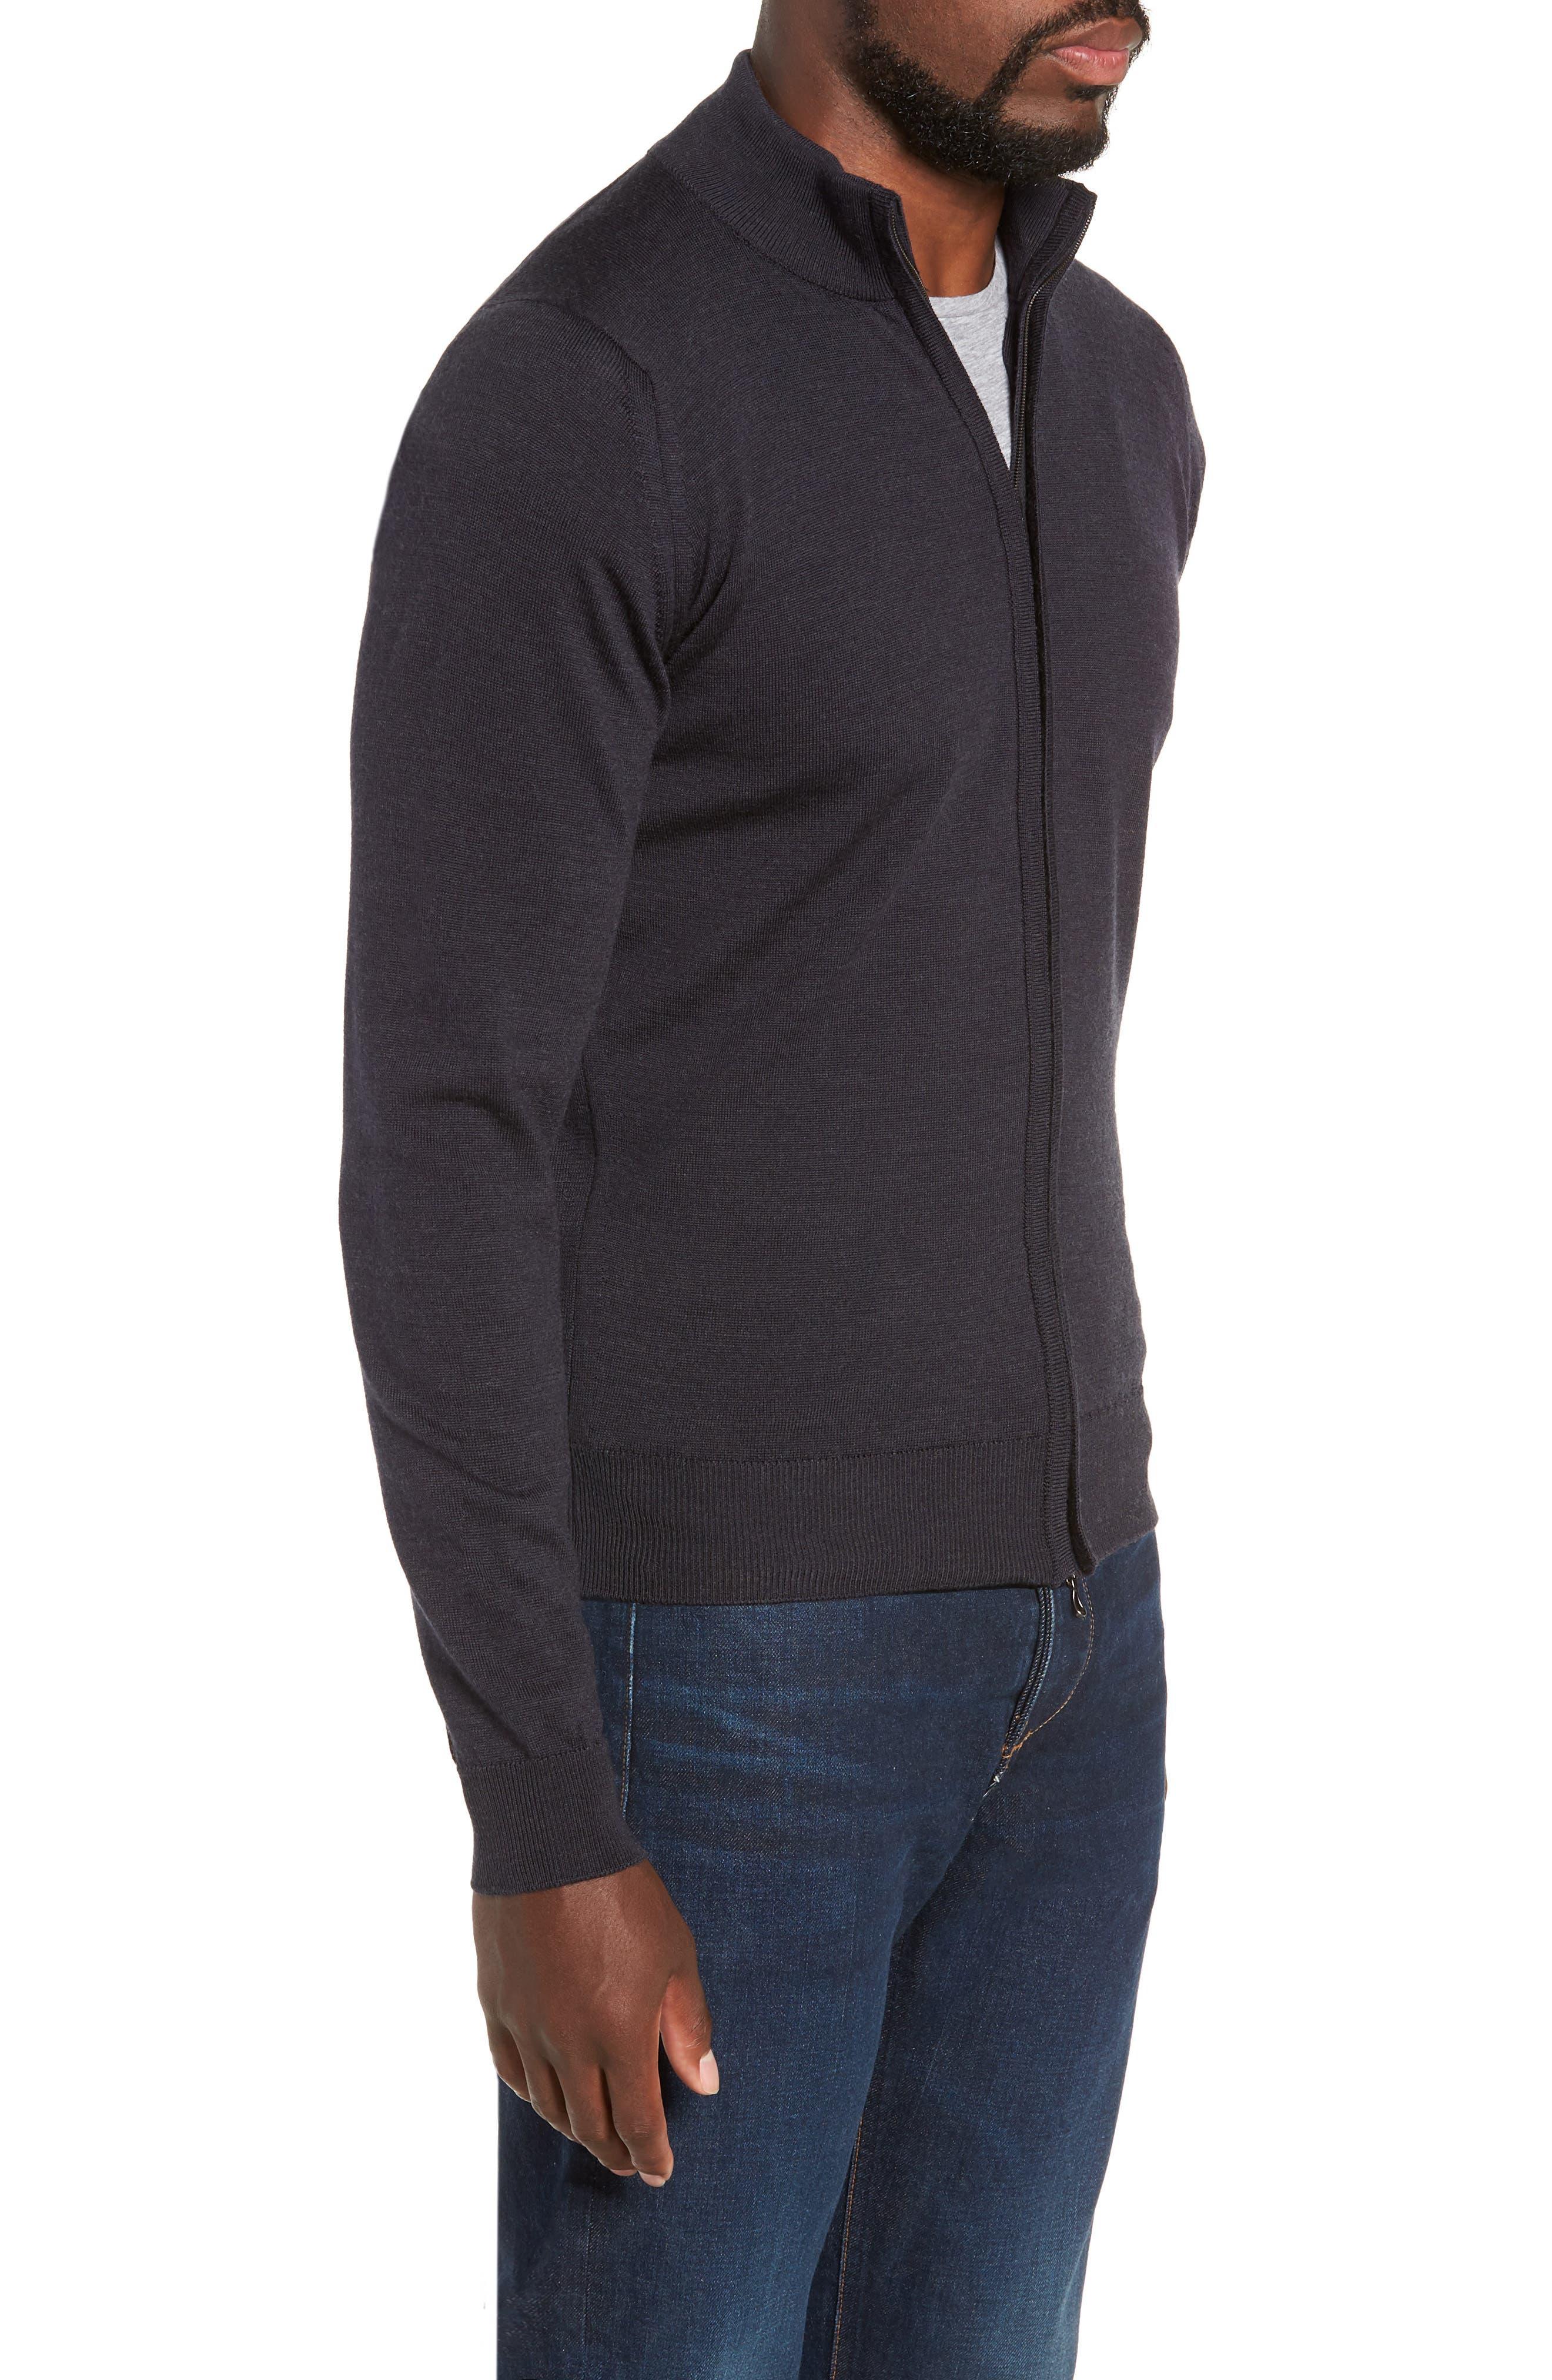 Claygate Slim Fit Merino Wool Zip Jacket,                             Alternate thumbnail 3, color,                             HEPBURN SMOKE